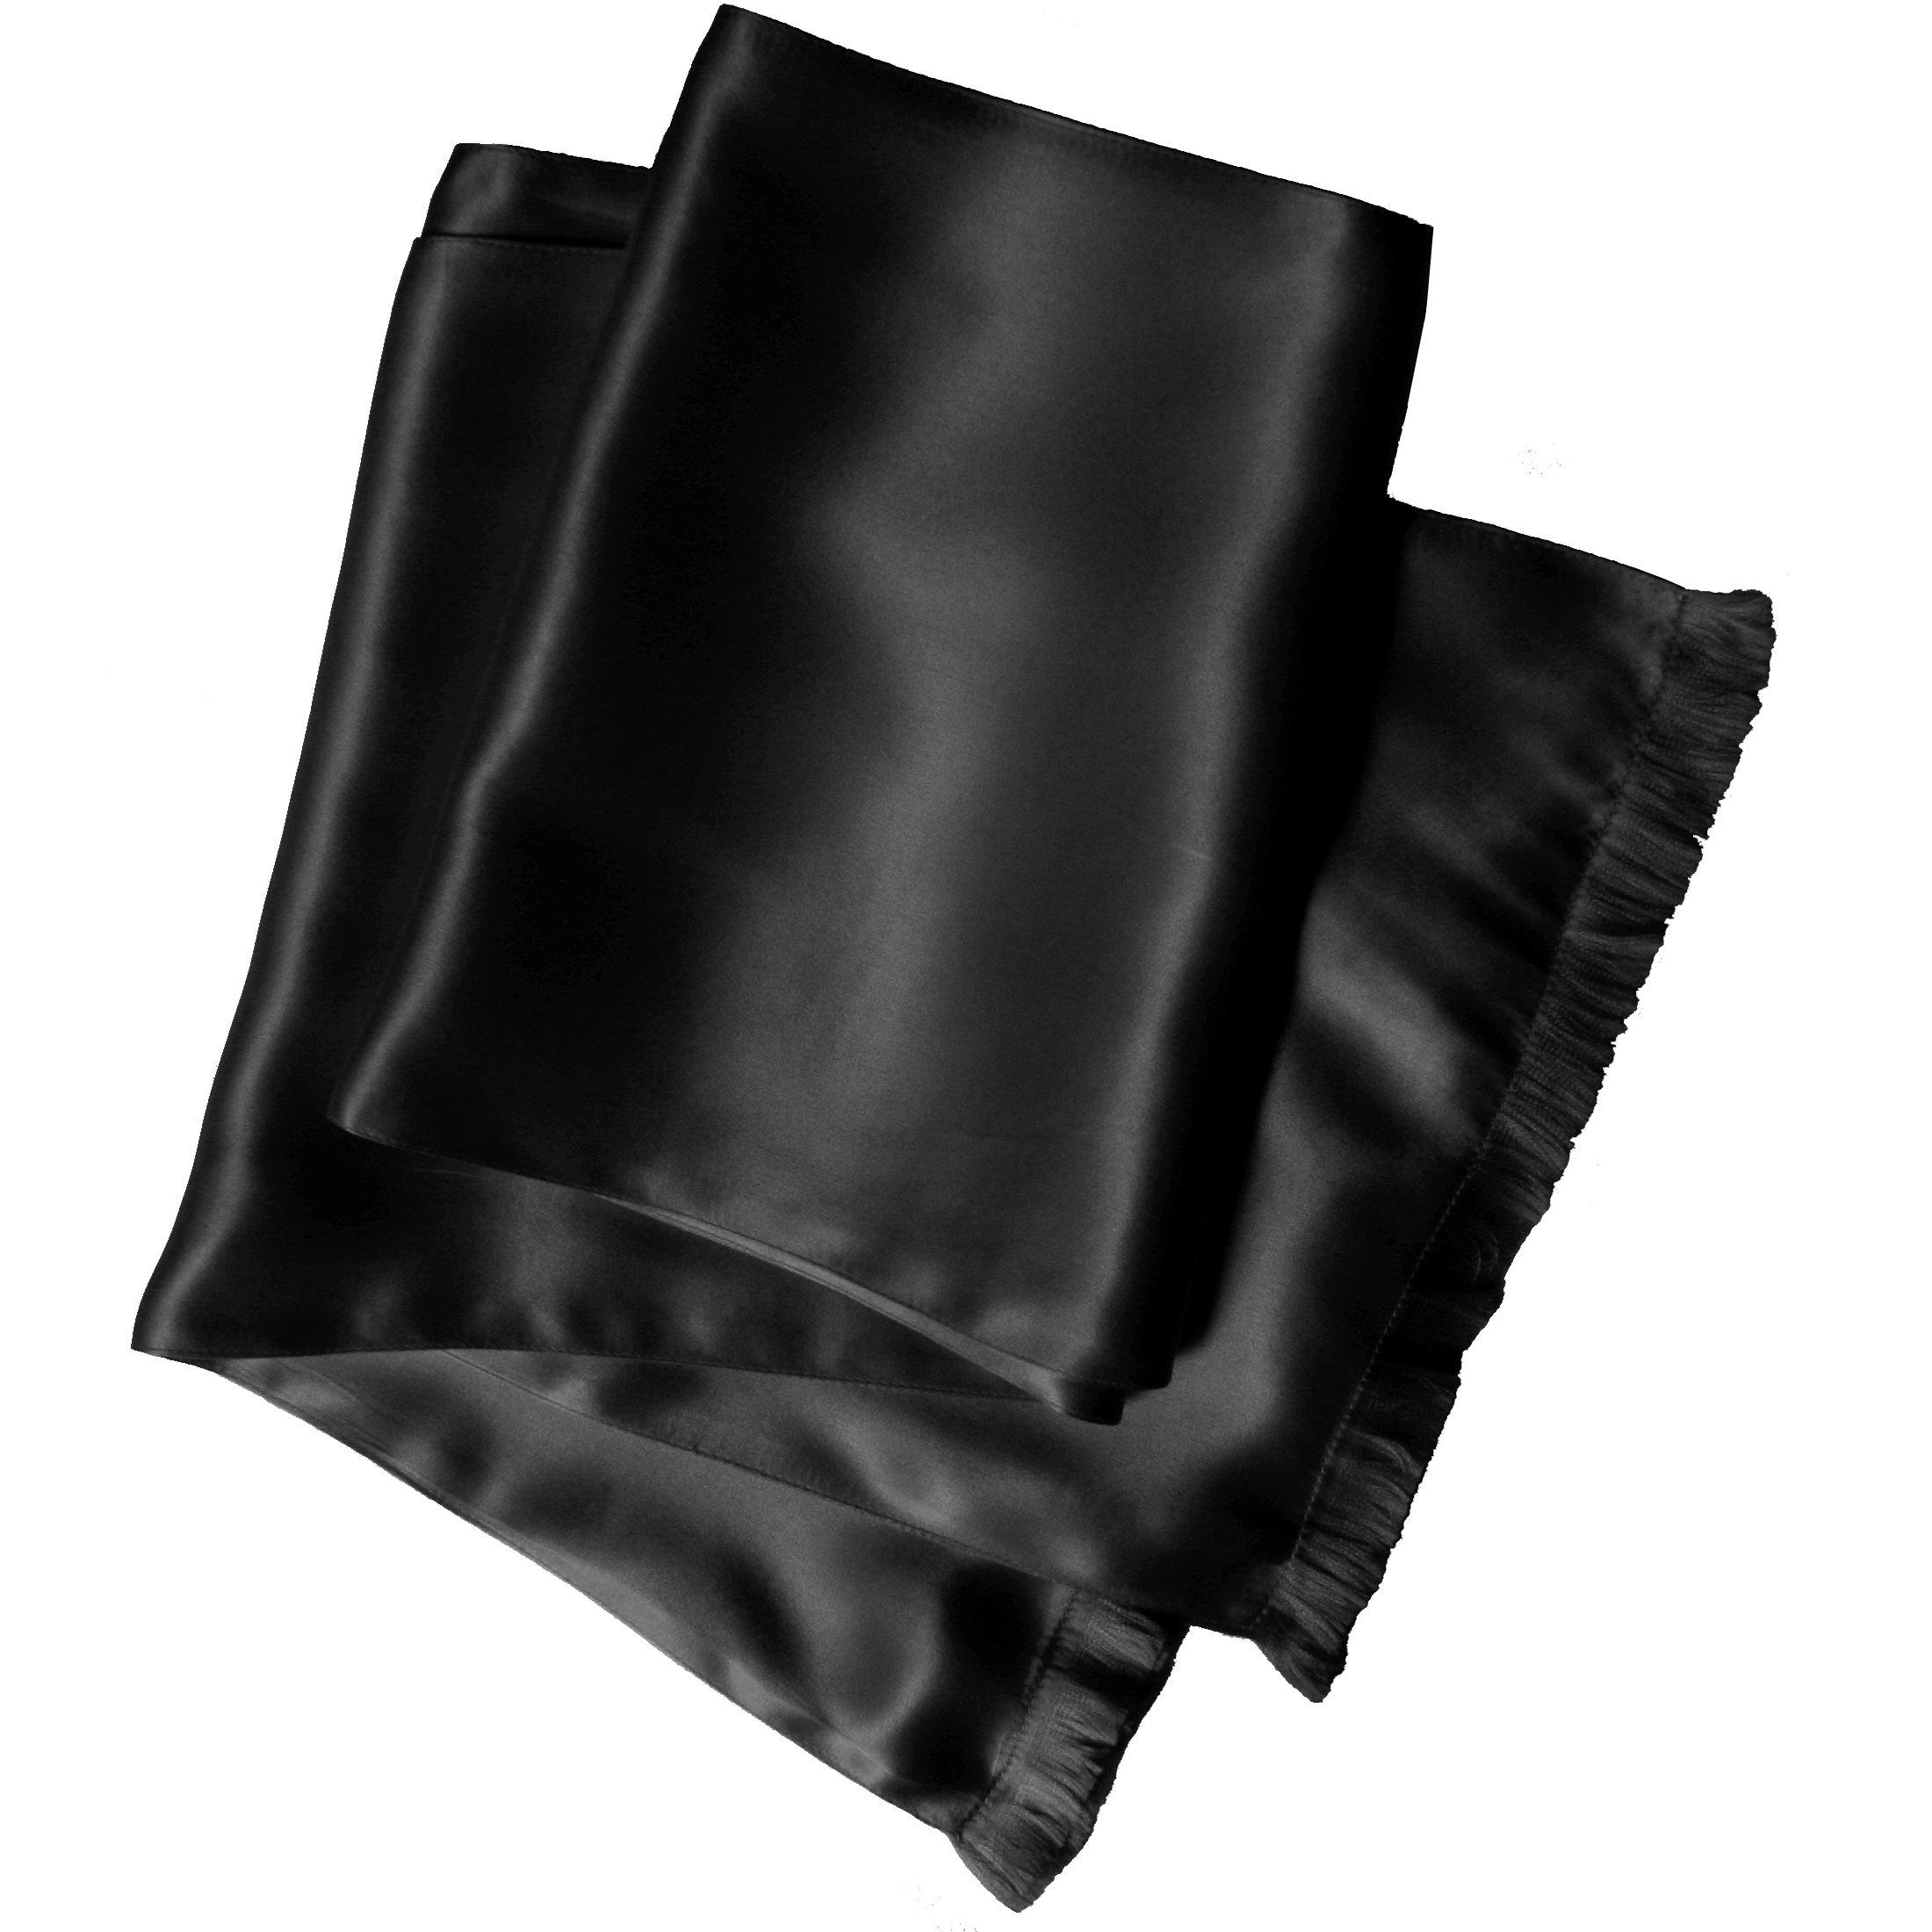 Black Silk Aviator Scarf for Men - Double Layered Satin Silk - Royal Silk